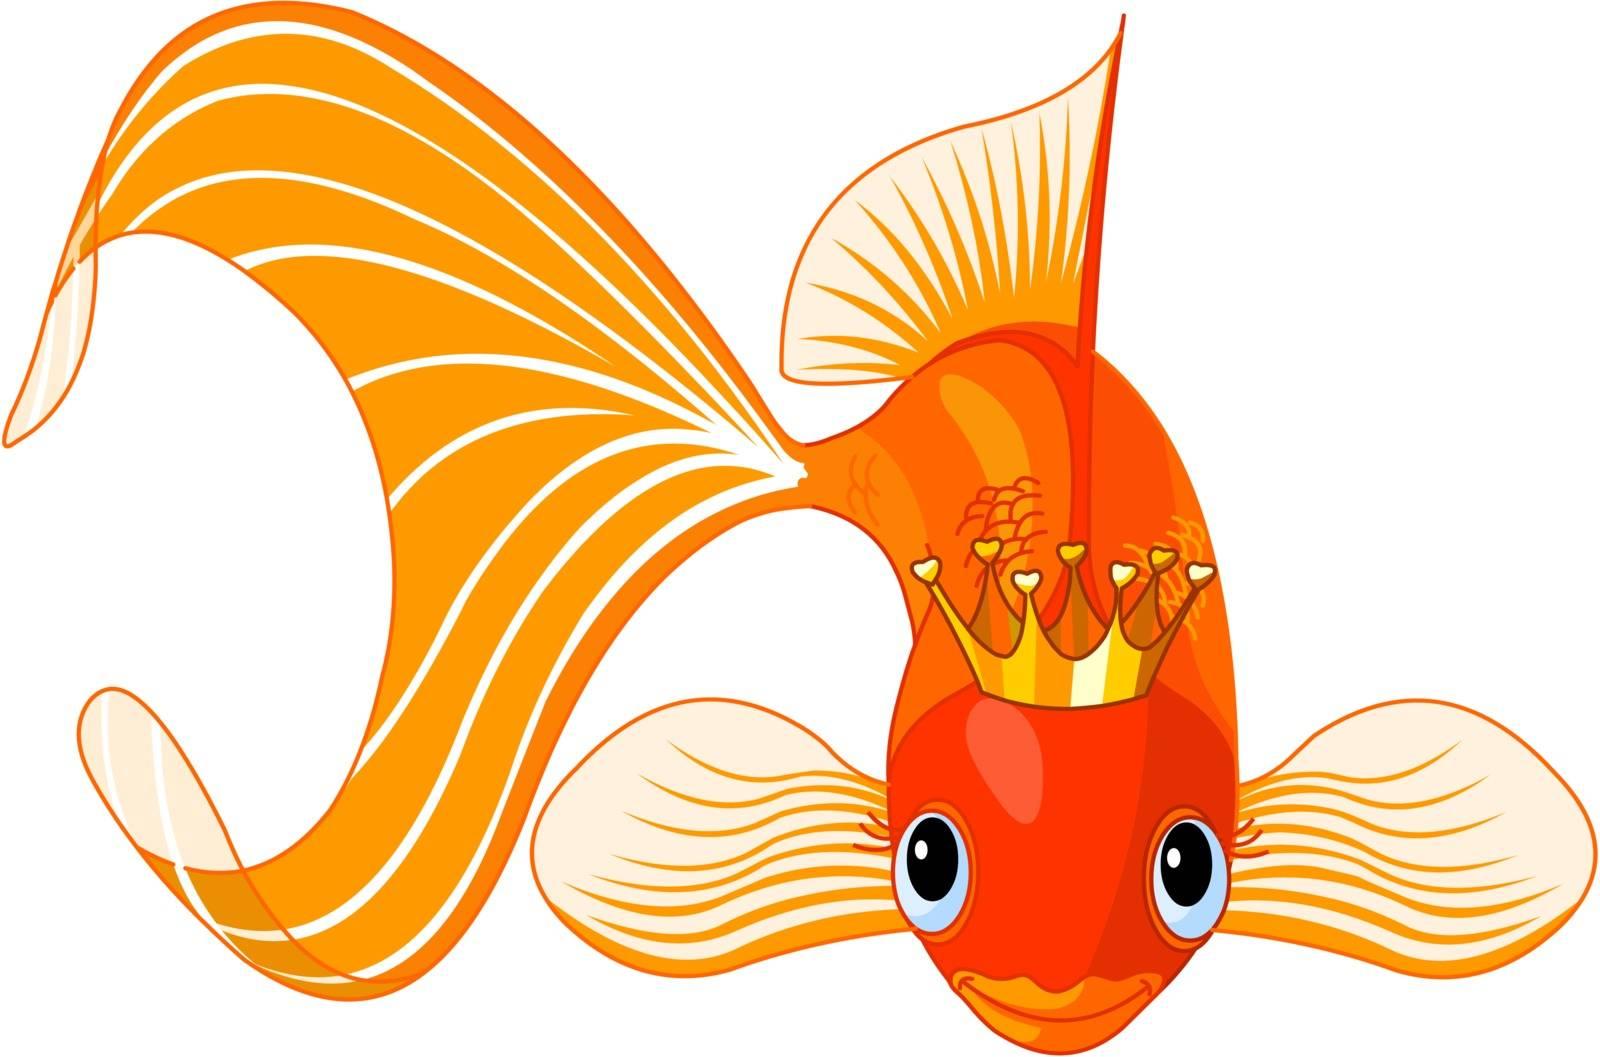 Goldfish queen by Dazdraperma